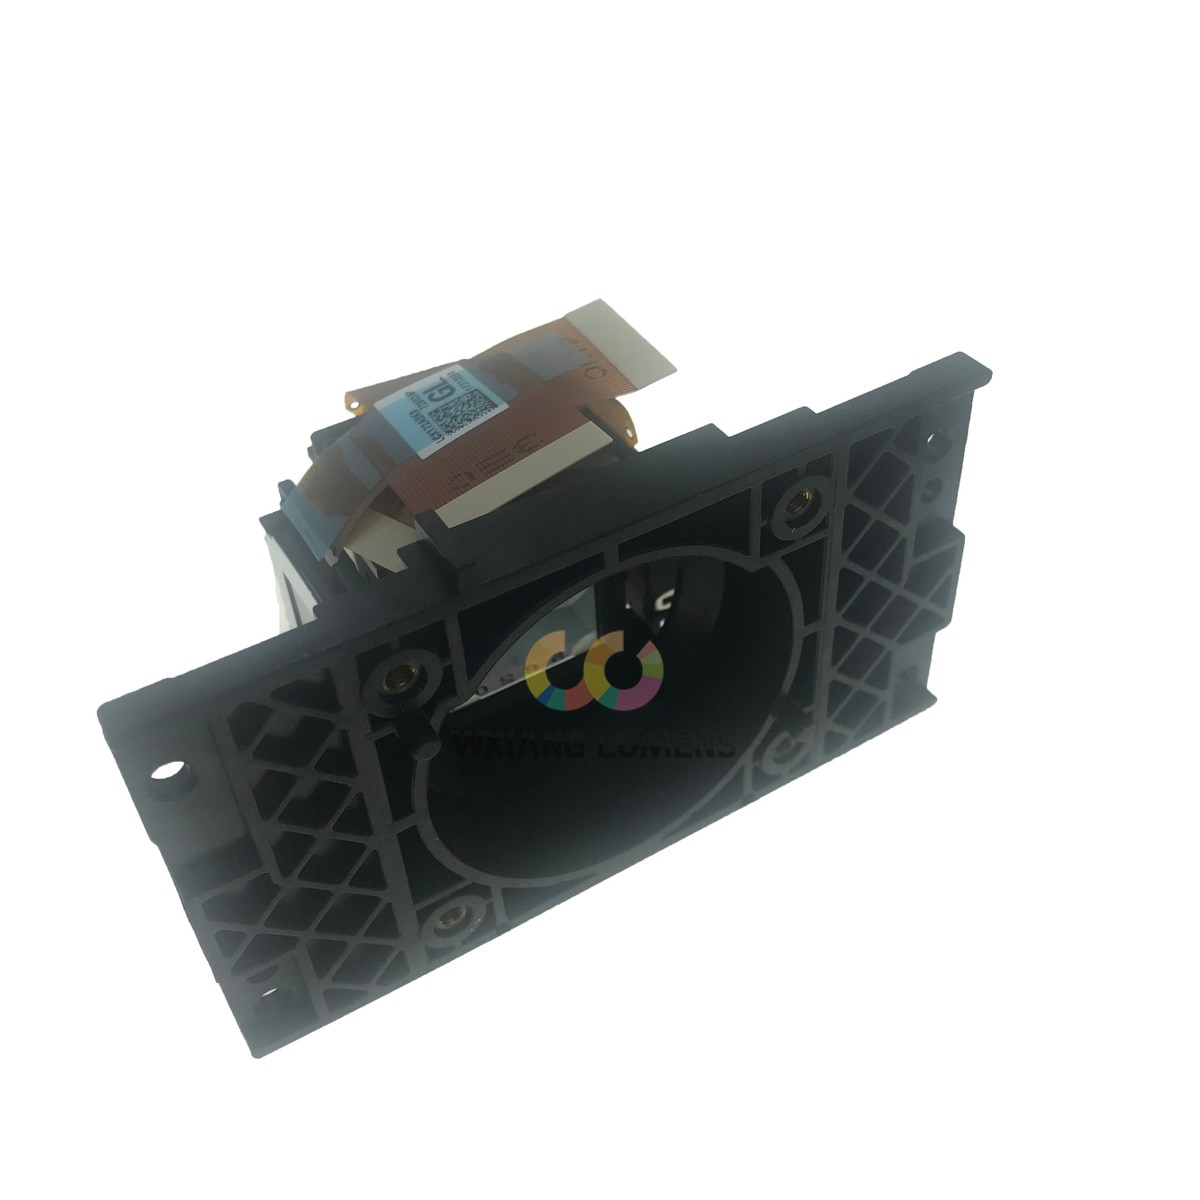 LCX172 LCD المنشور الجملة محرك بصري لباناسونيك PT-VX410/VX420/VX425/VX430/VX500 العارض